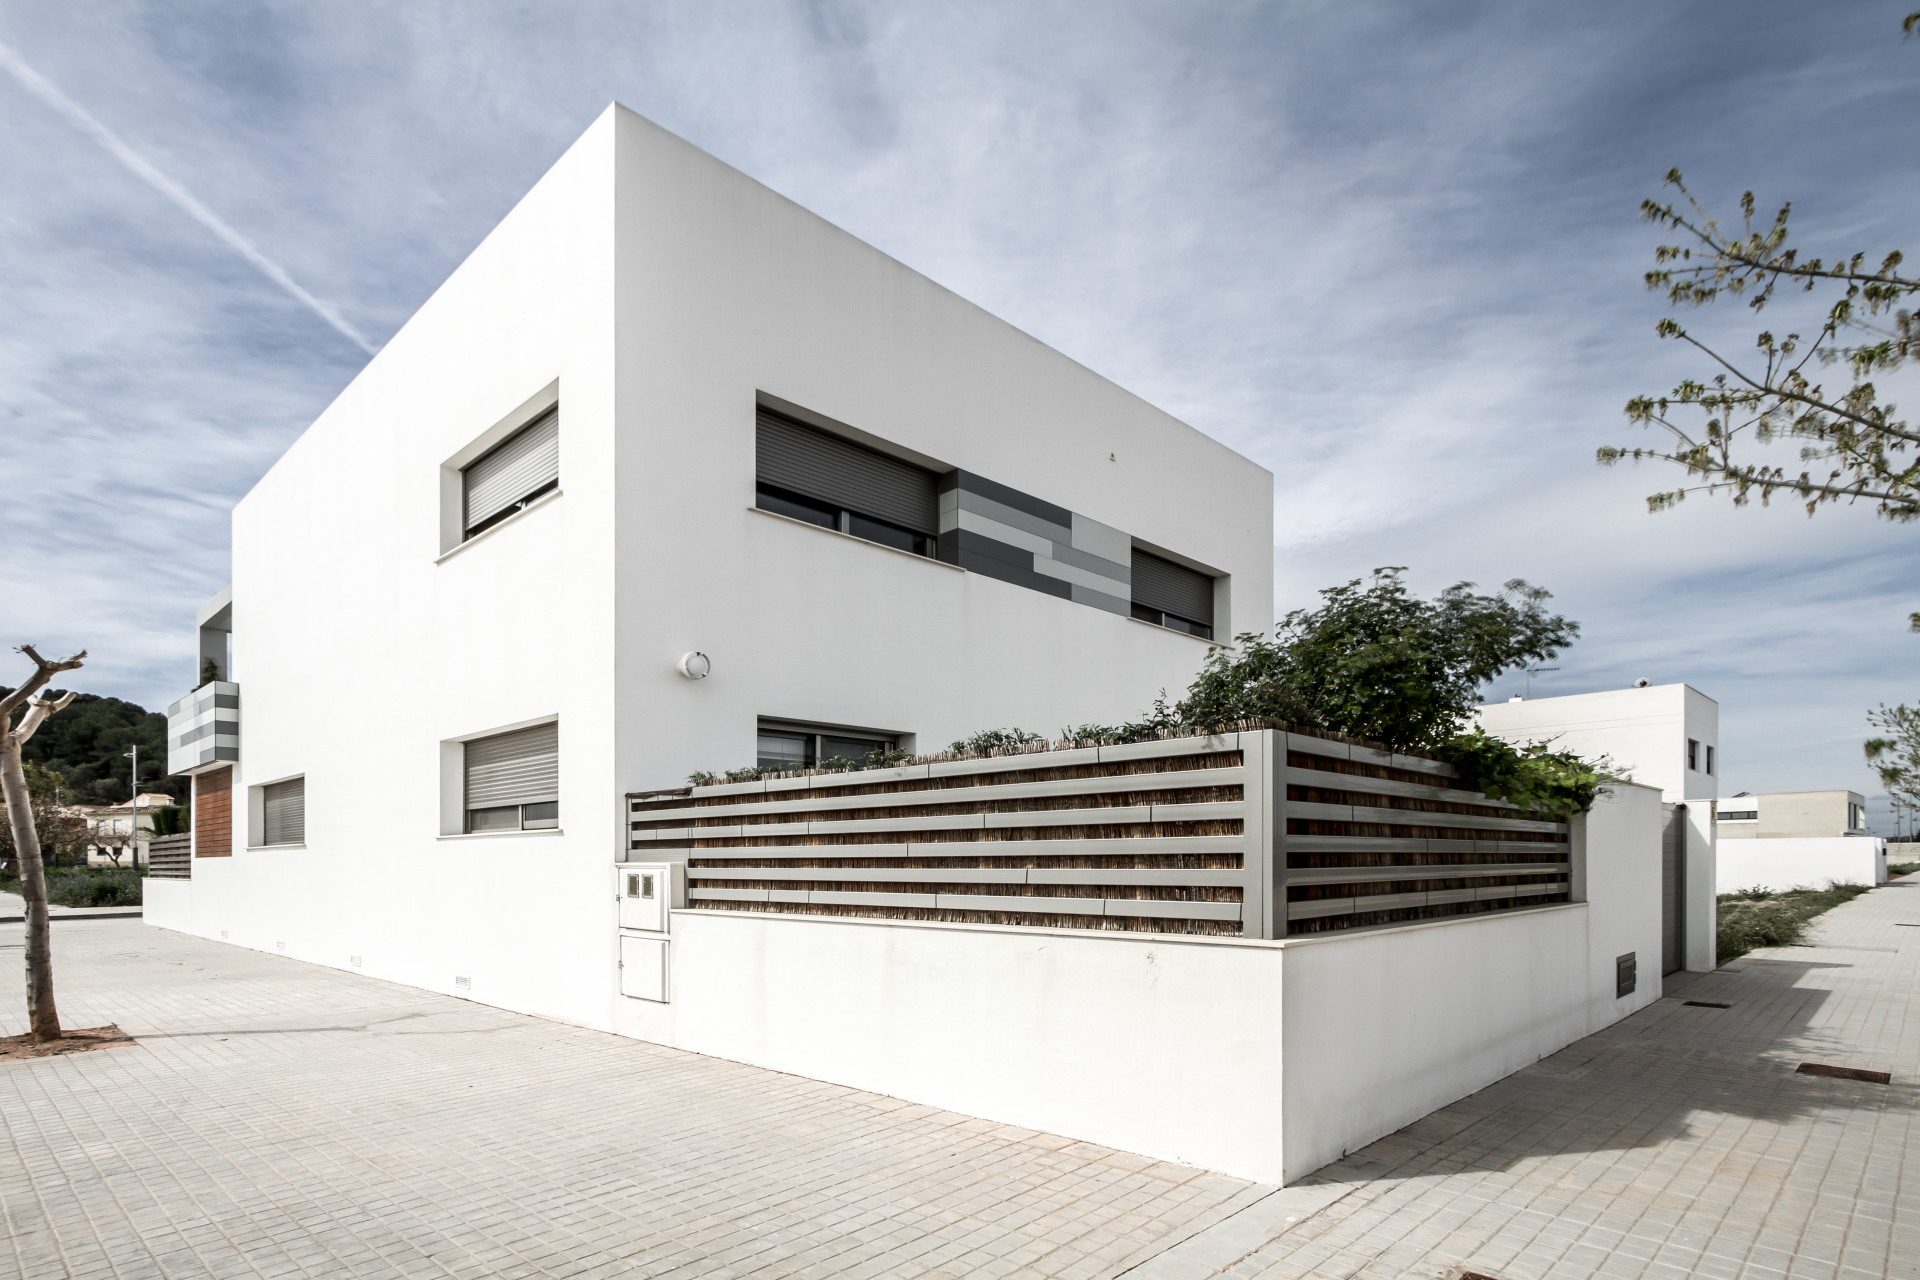 fotografia-arquitectura-valencia-german-cabo-viraje-v02 (4)